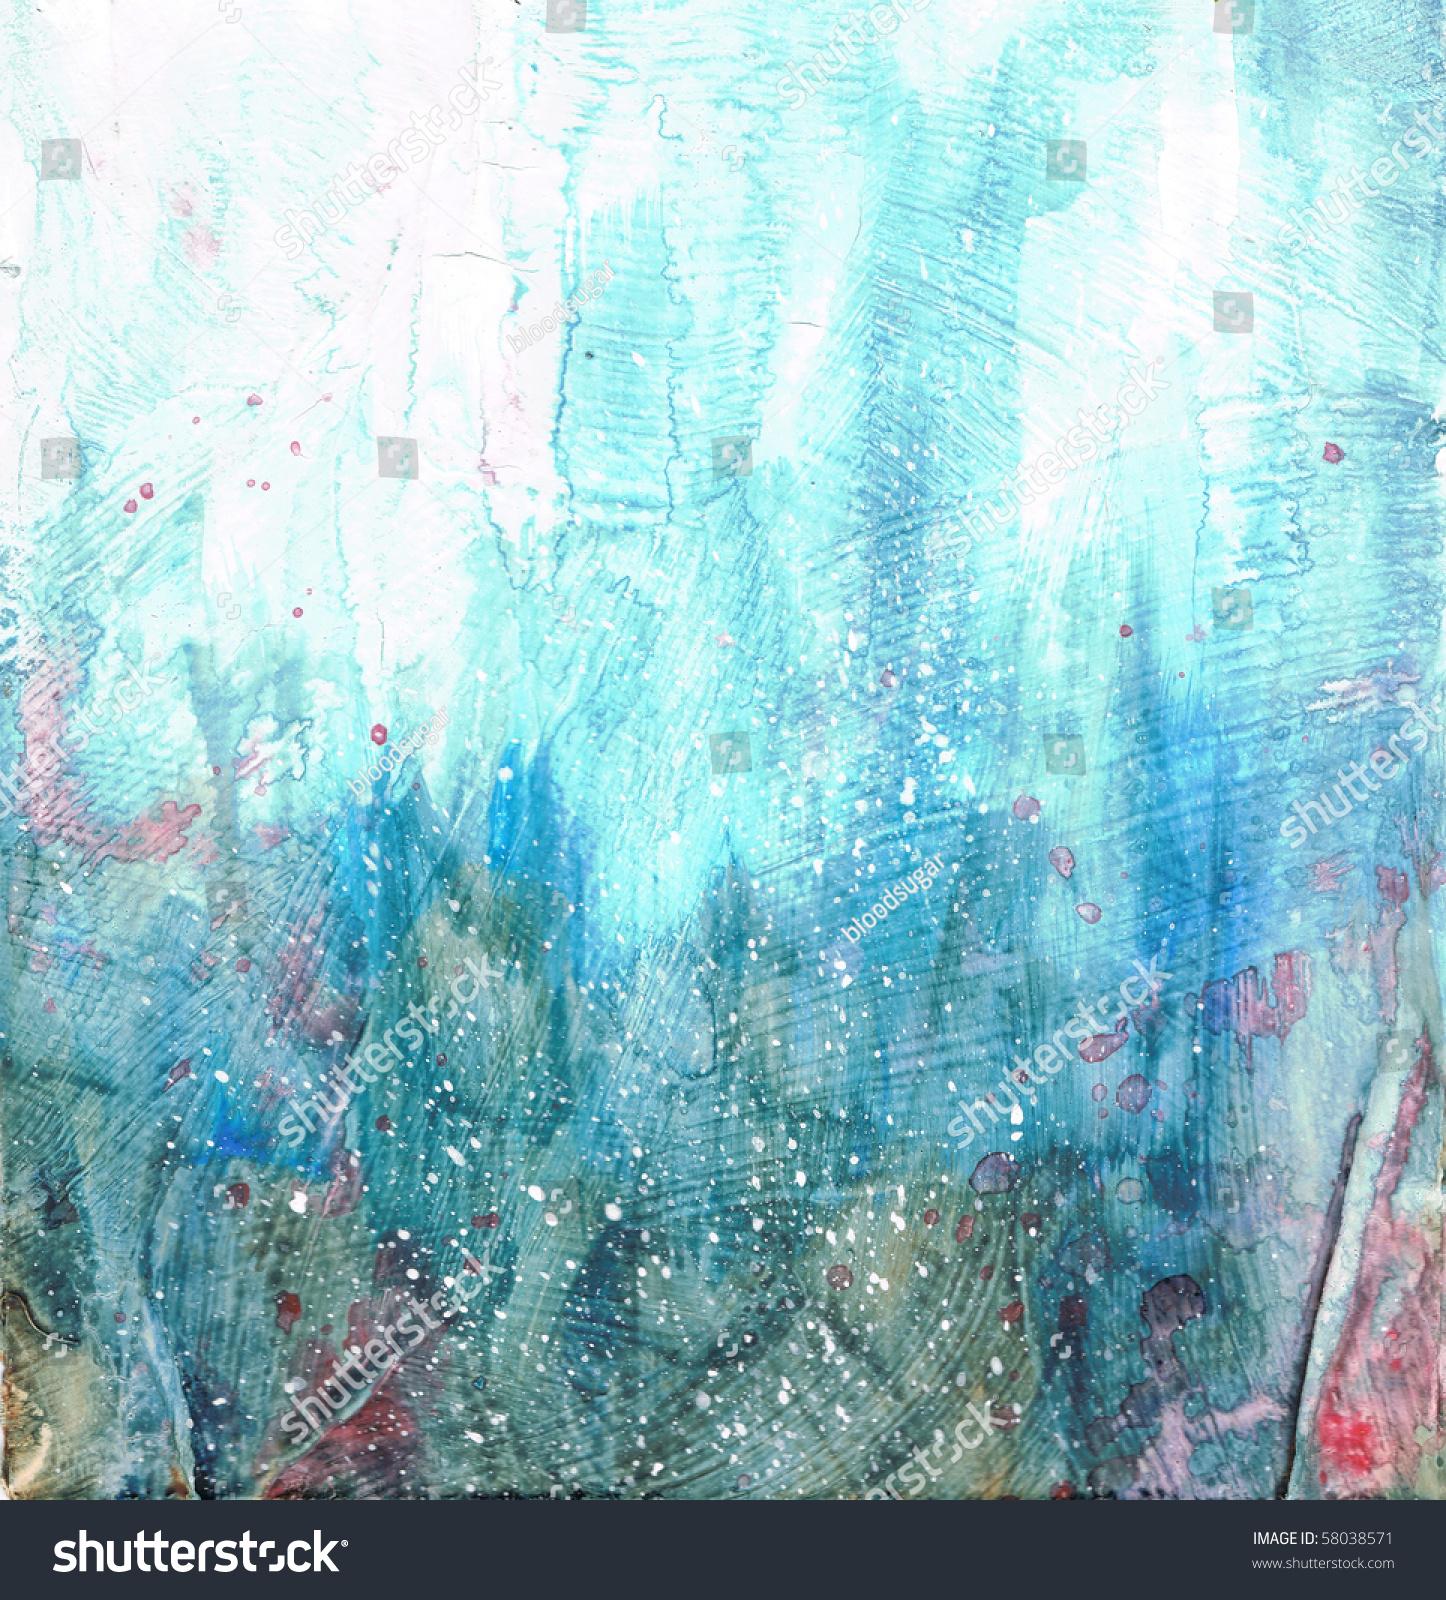 beautiful watercolor wallpapers - photo #38